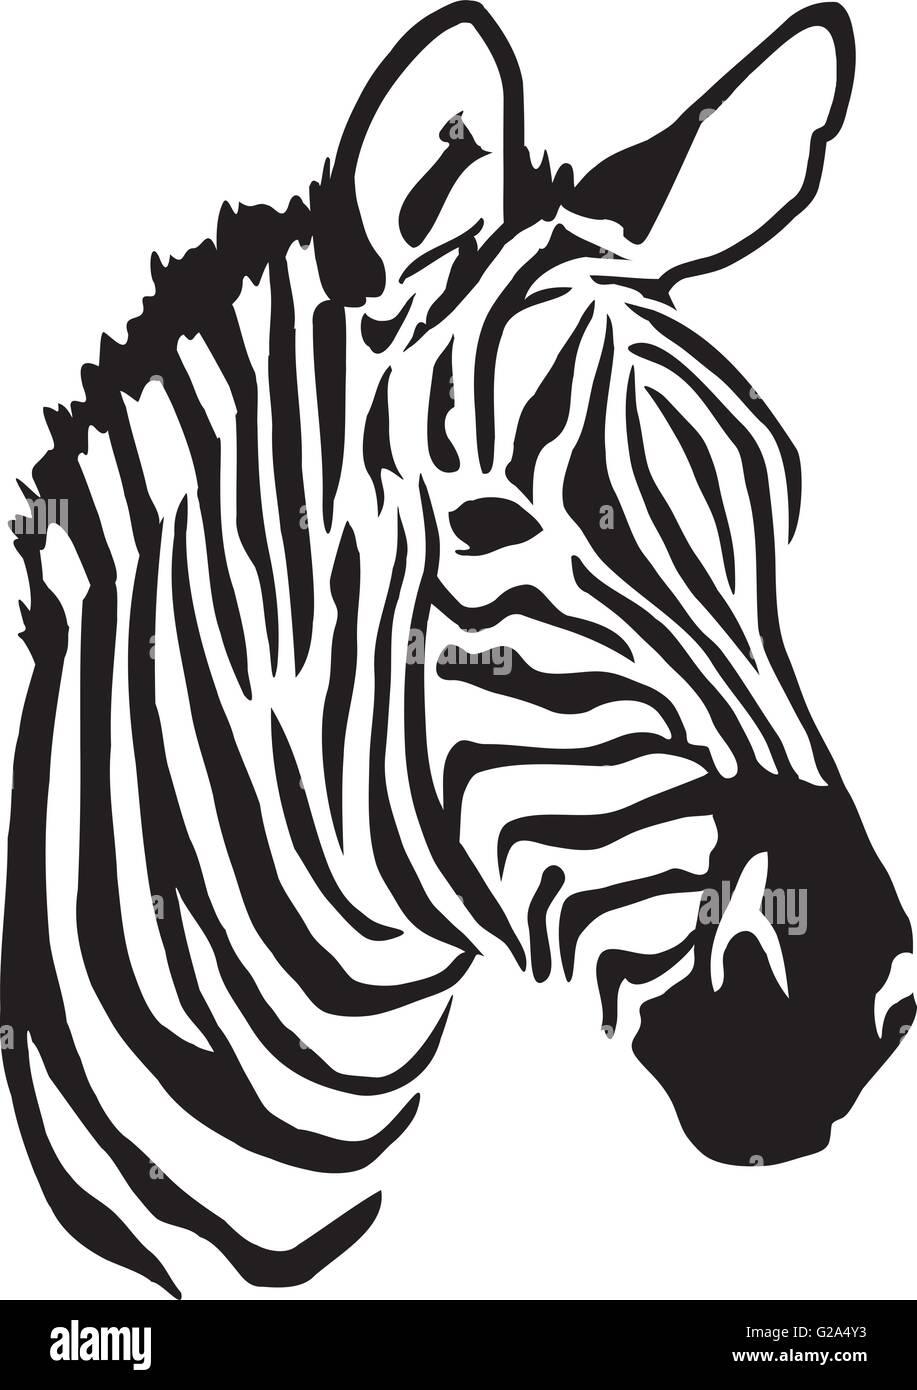 Zebra Vectors Stock Photos & Zebra Vectors Stock Images - Alamy